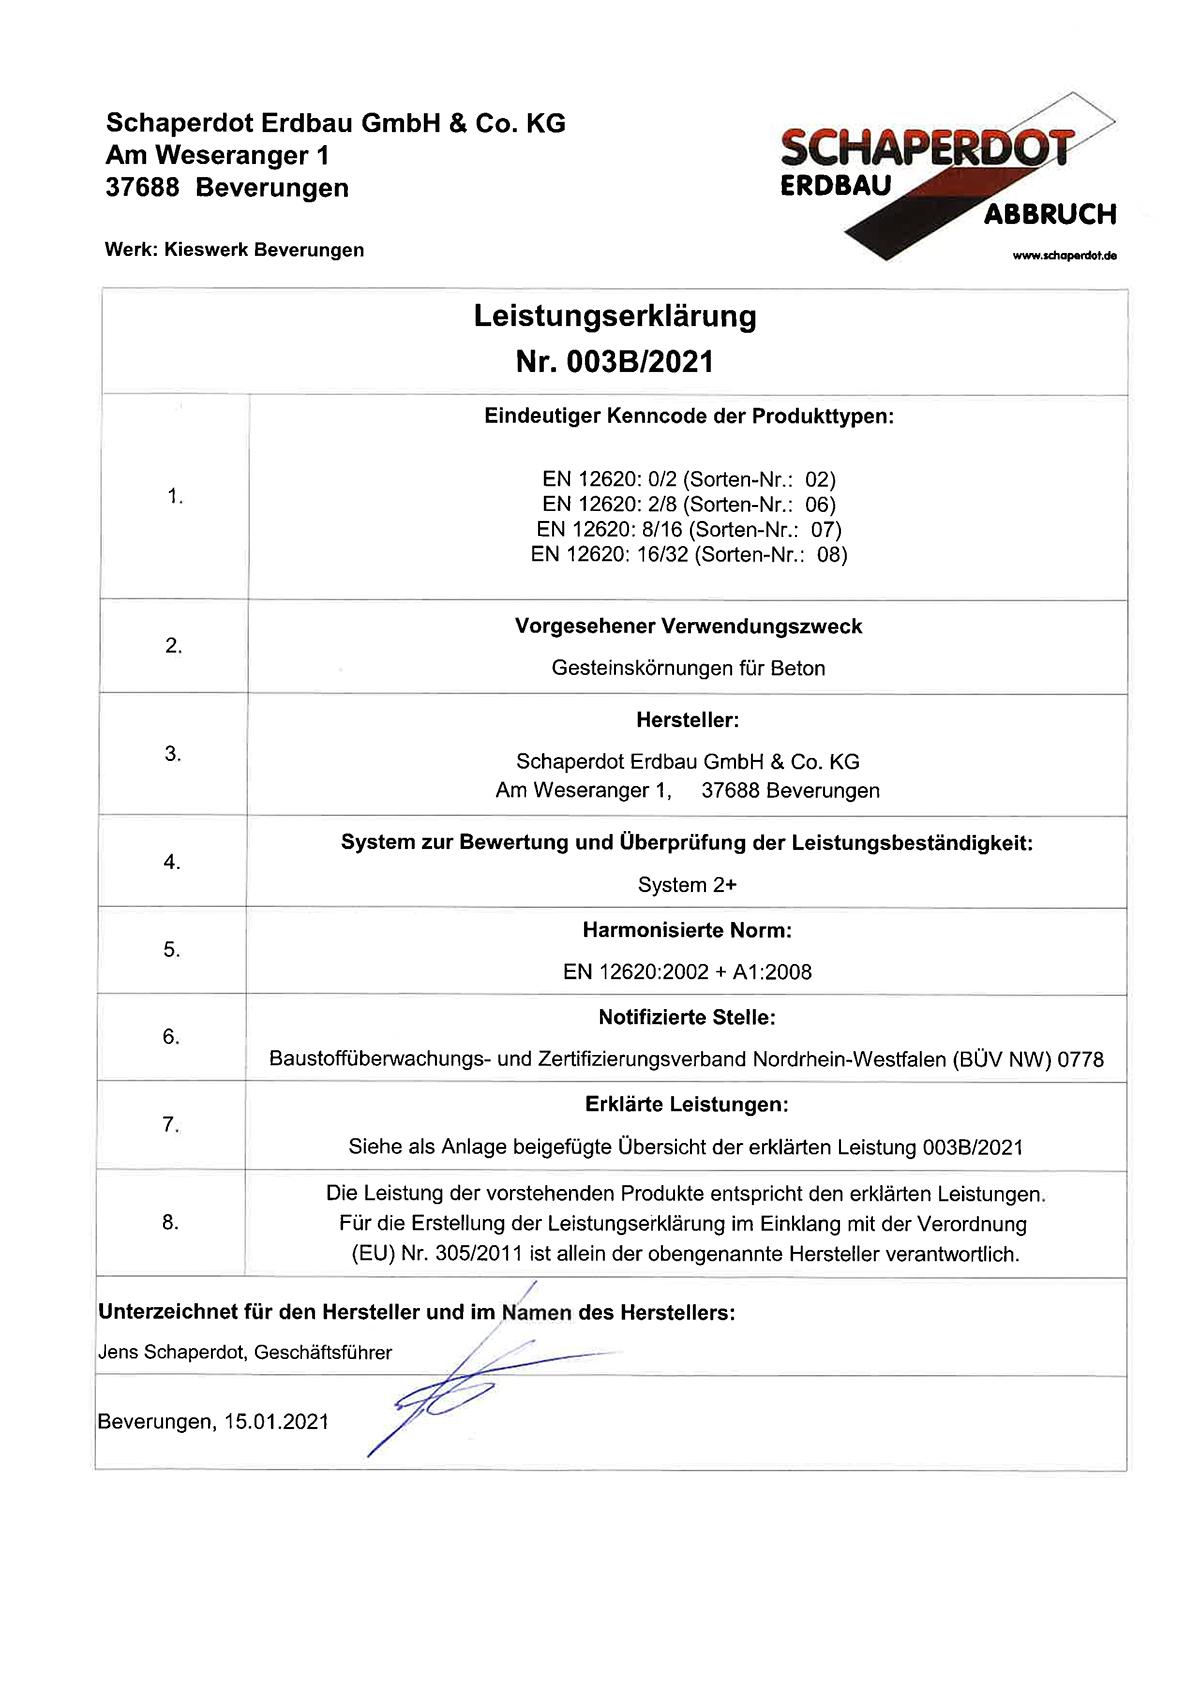 Leistungserklärung 003B 2021